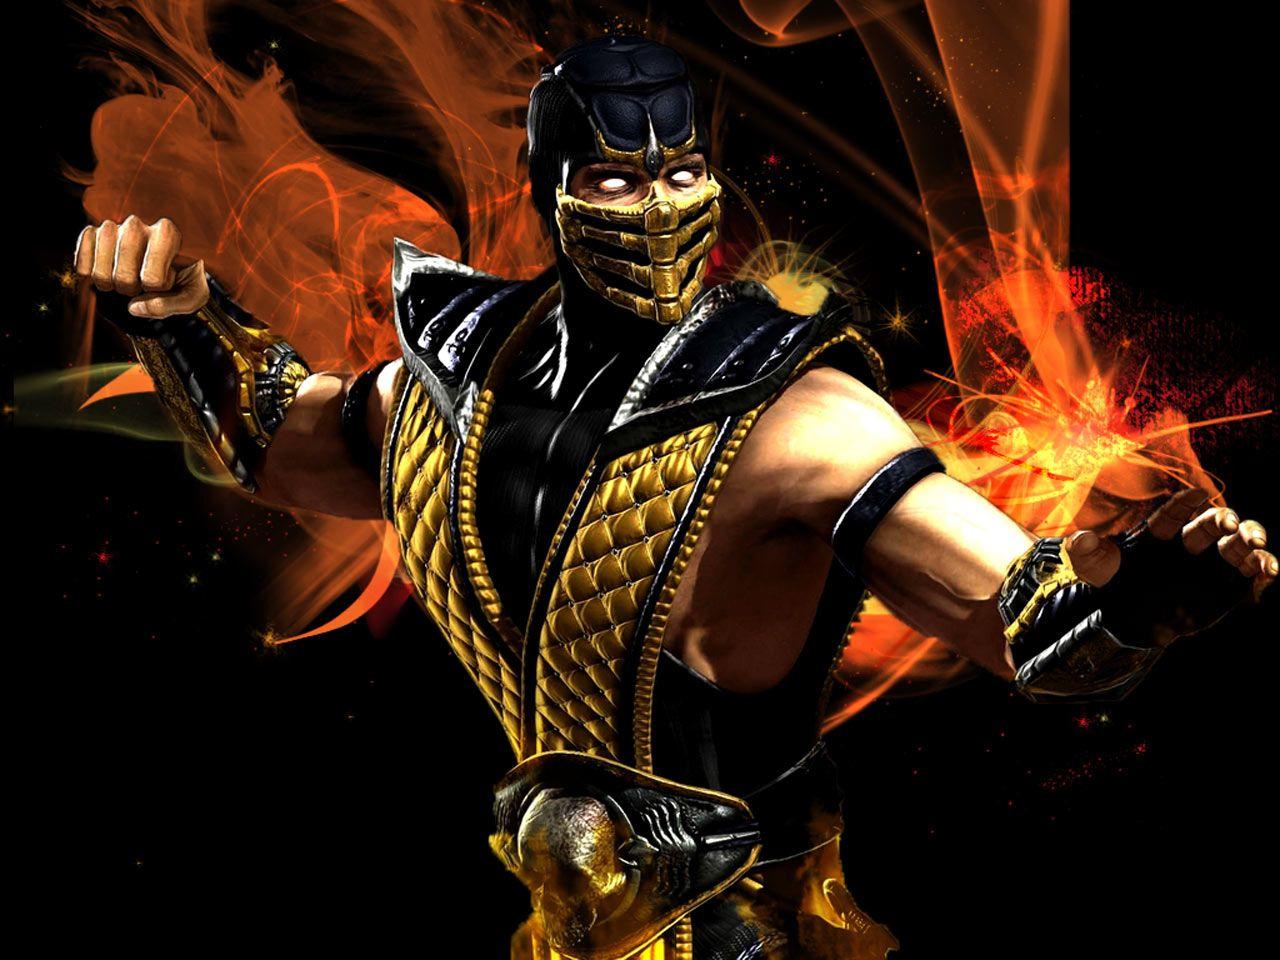 Mortal Kombat Shaolin Monks Wallpapers For Desktop